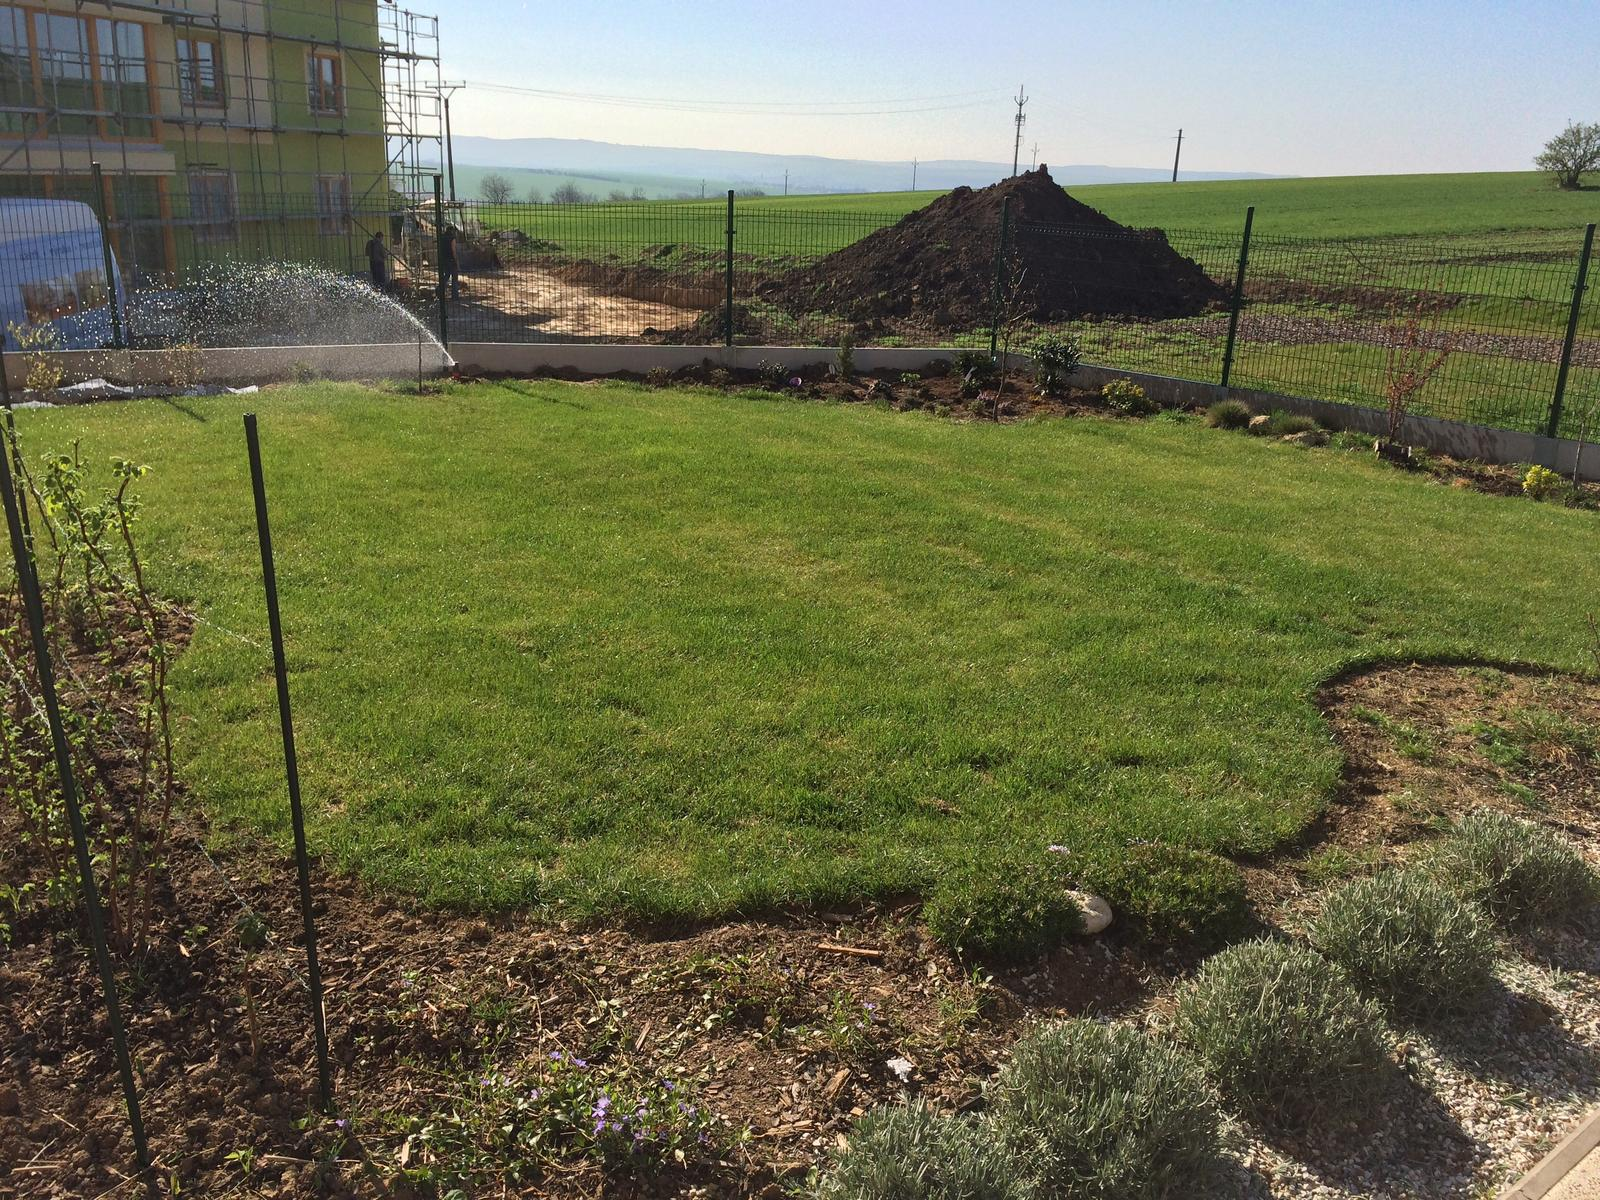 Zahradka nasa 2015 - zaciname zavlazovat.. dneska ma byt velke teplo, tak snad travicka poporoste :)